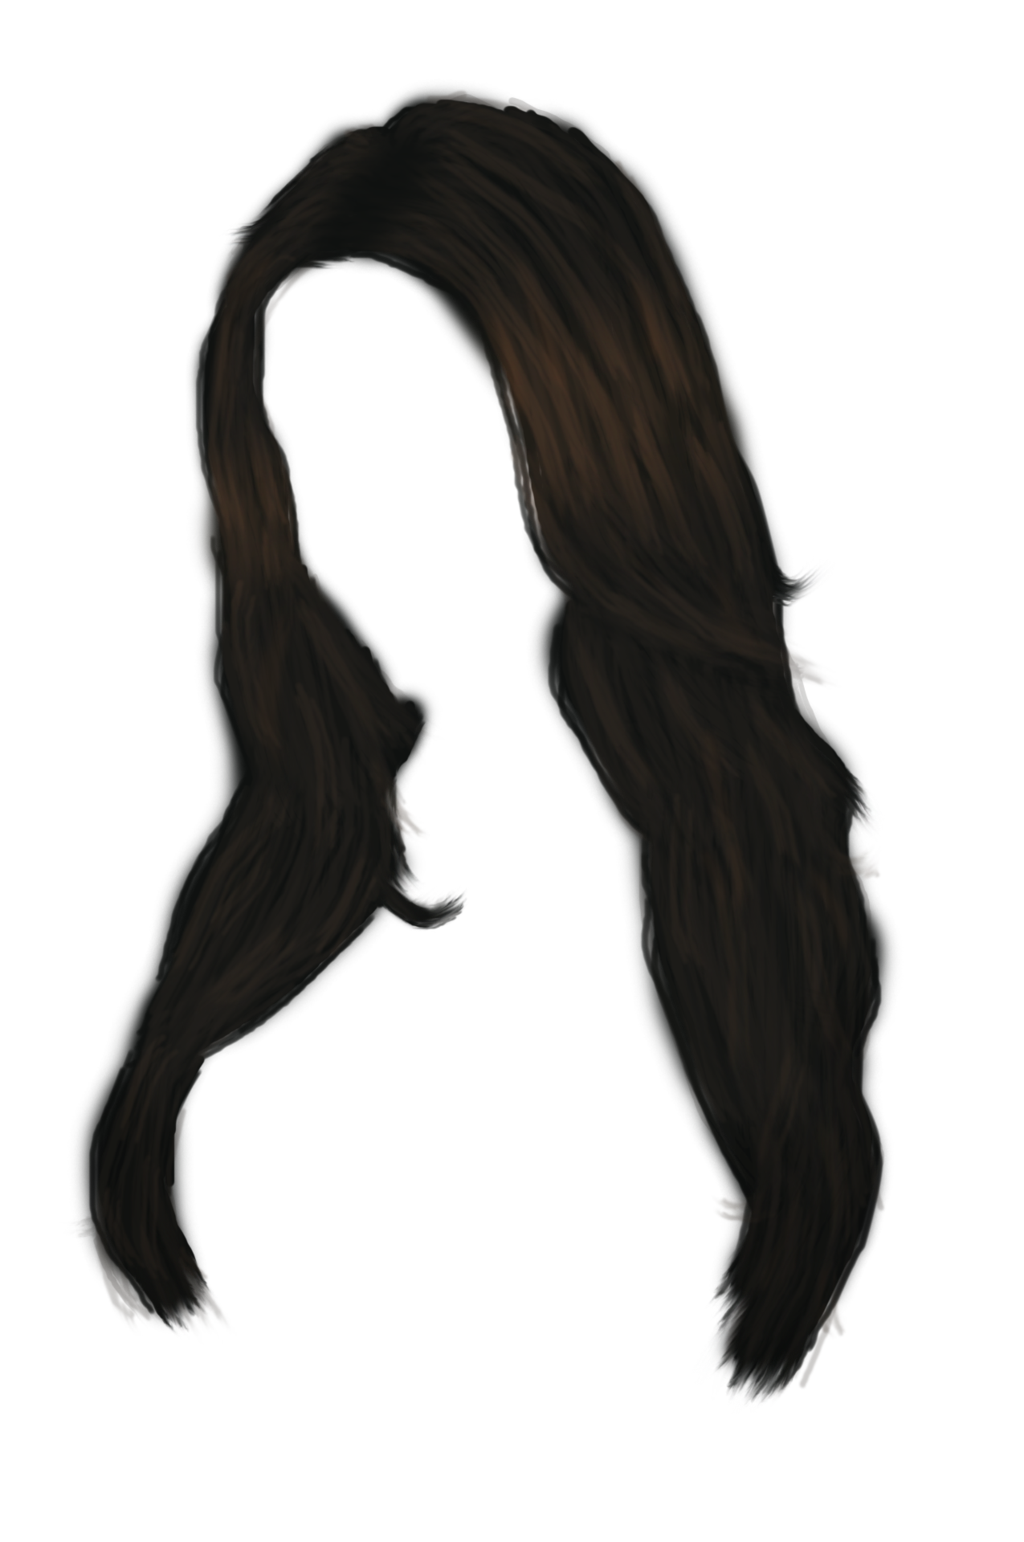 Hair clipart balck Download images women hairs hair